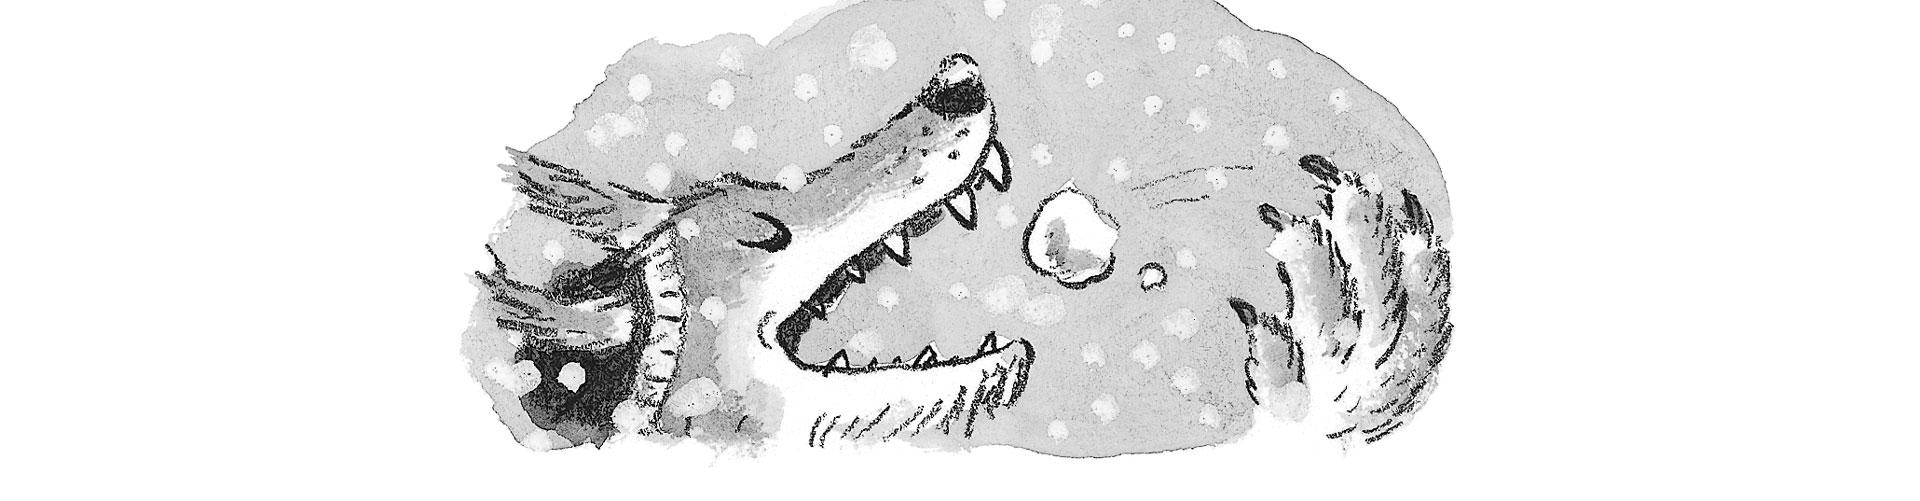 Dolfje-sneeuwwolfje-Paul-van-Loon-Hugo-van-Look